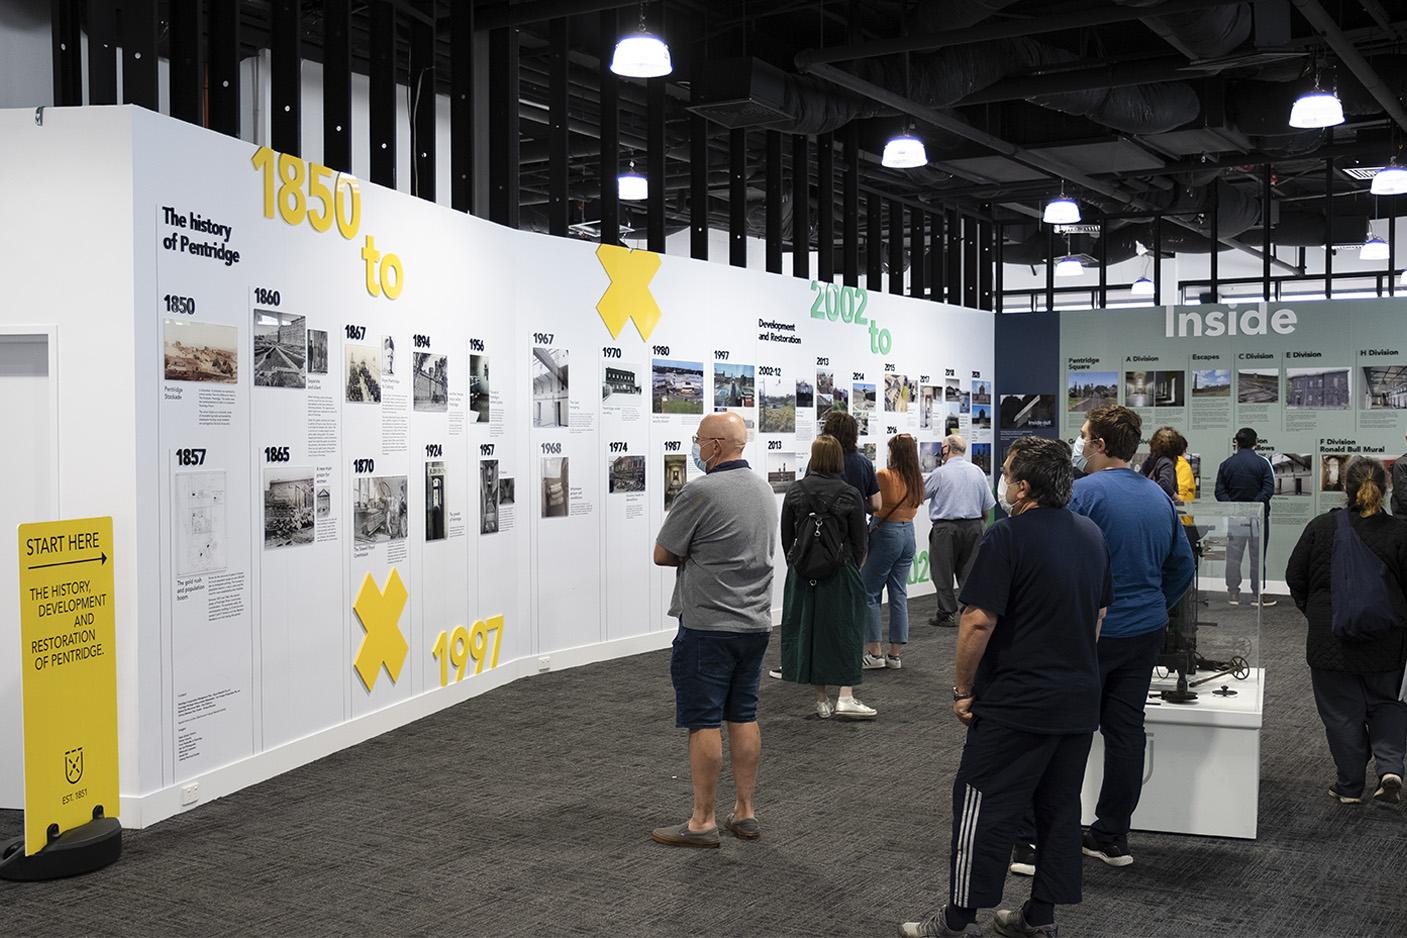 Pentridge History and Development Gallery